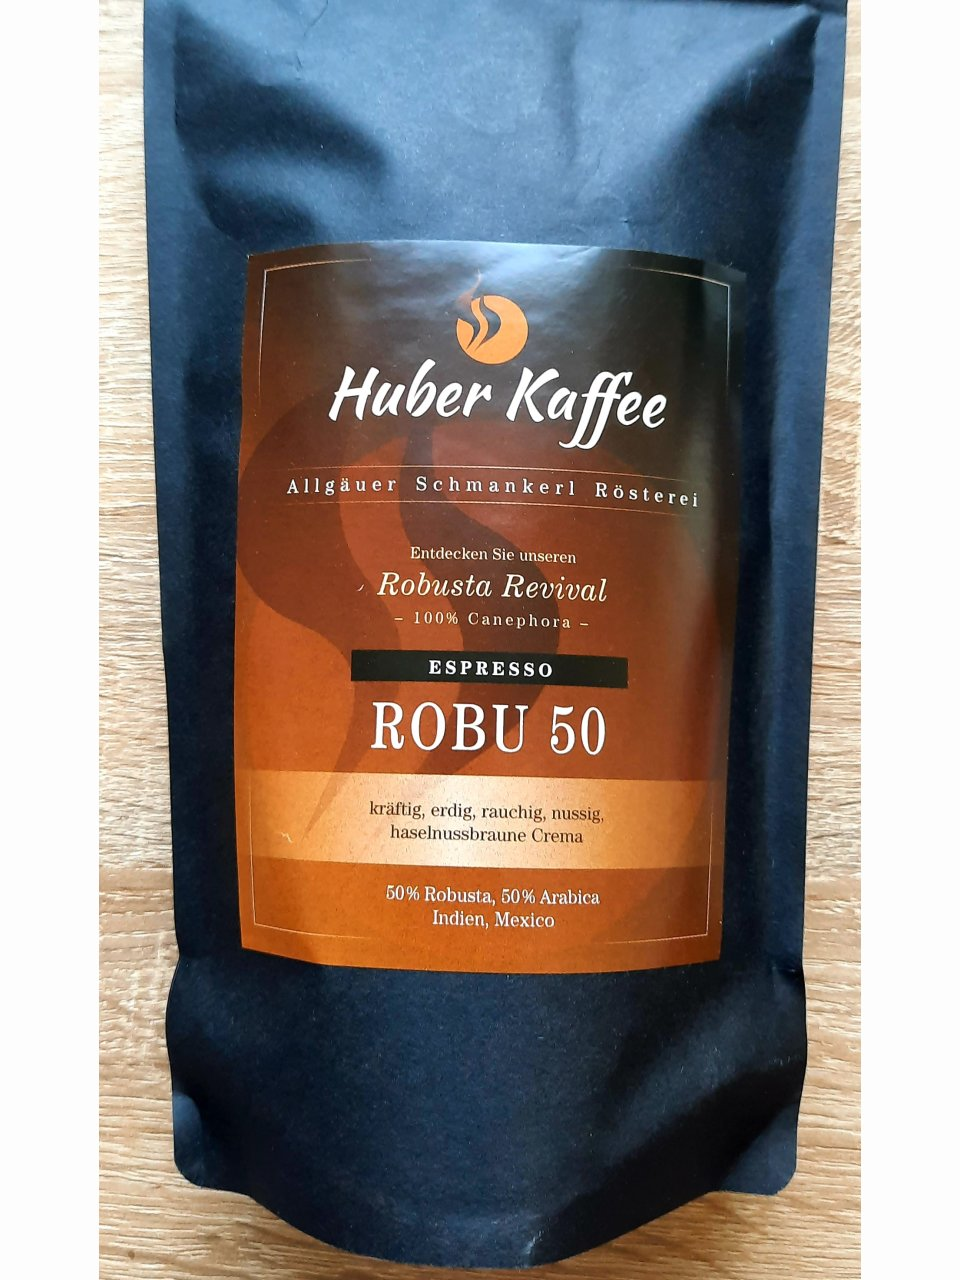 Espresso Robu 50